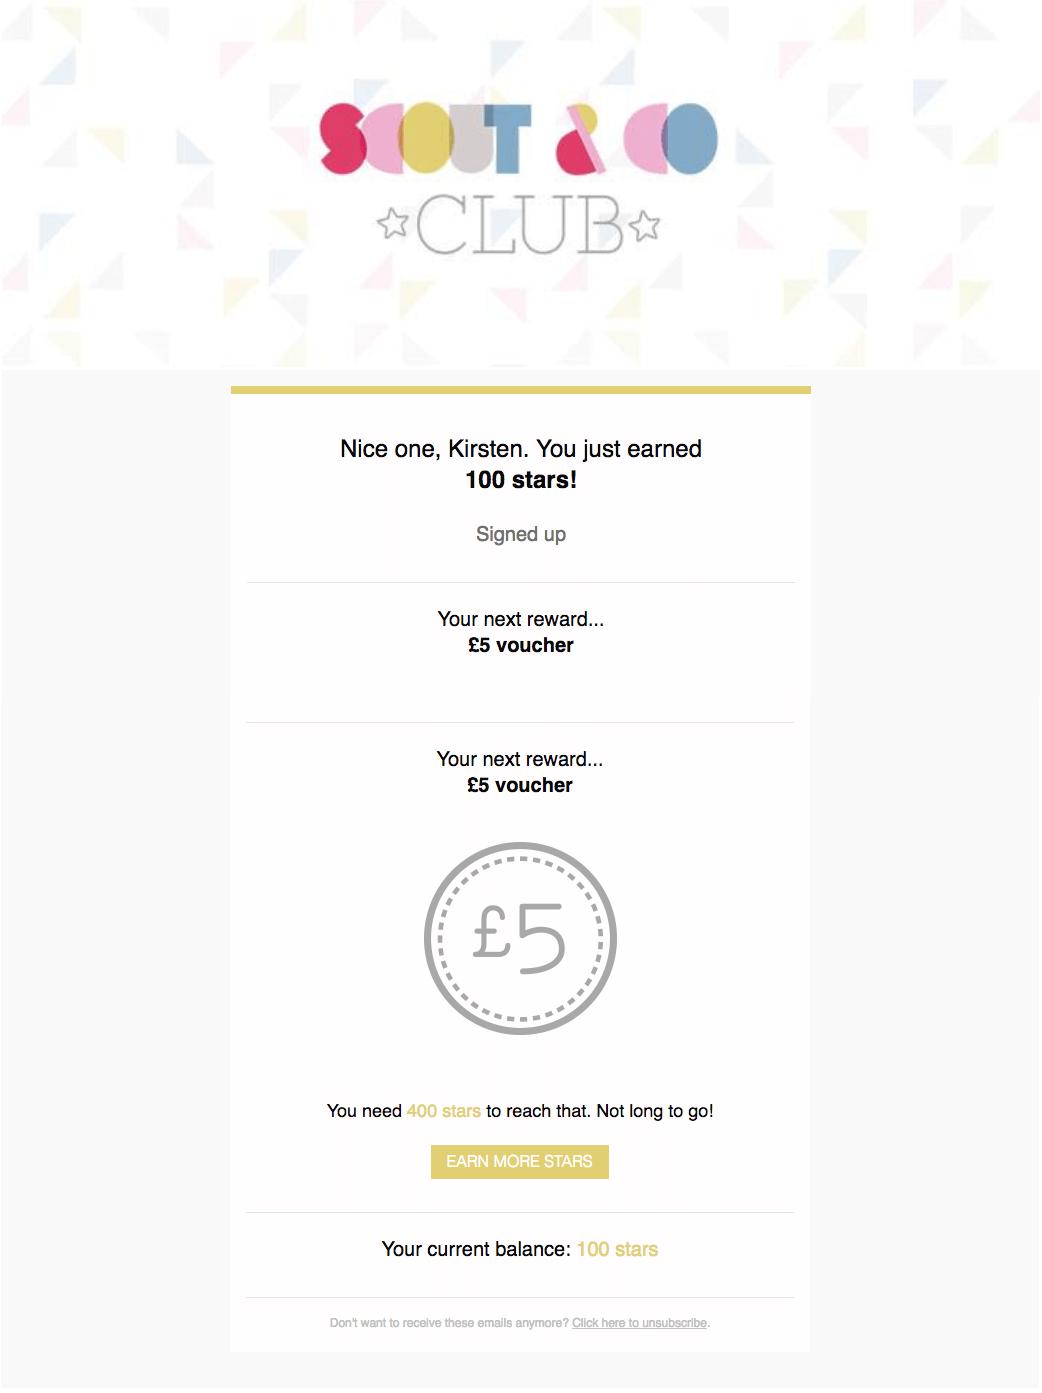 Scount & Co Club program status email